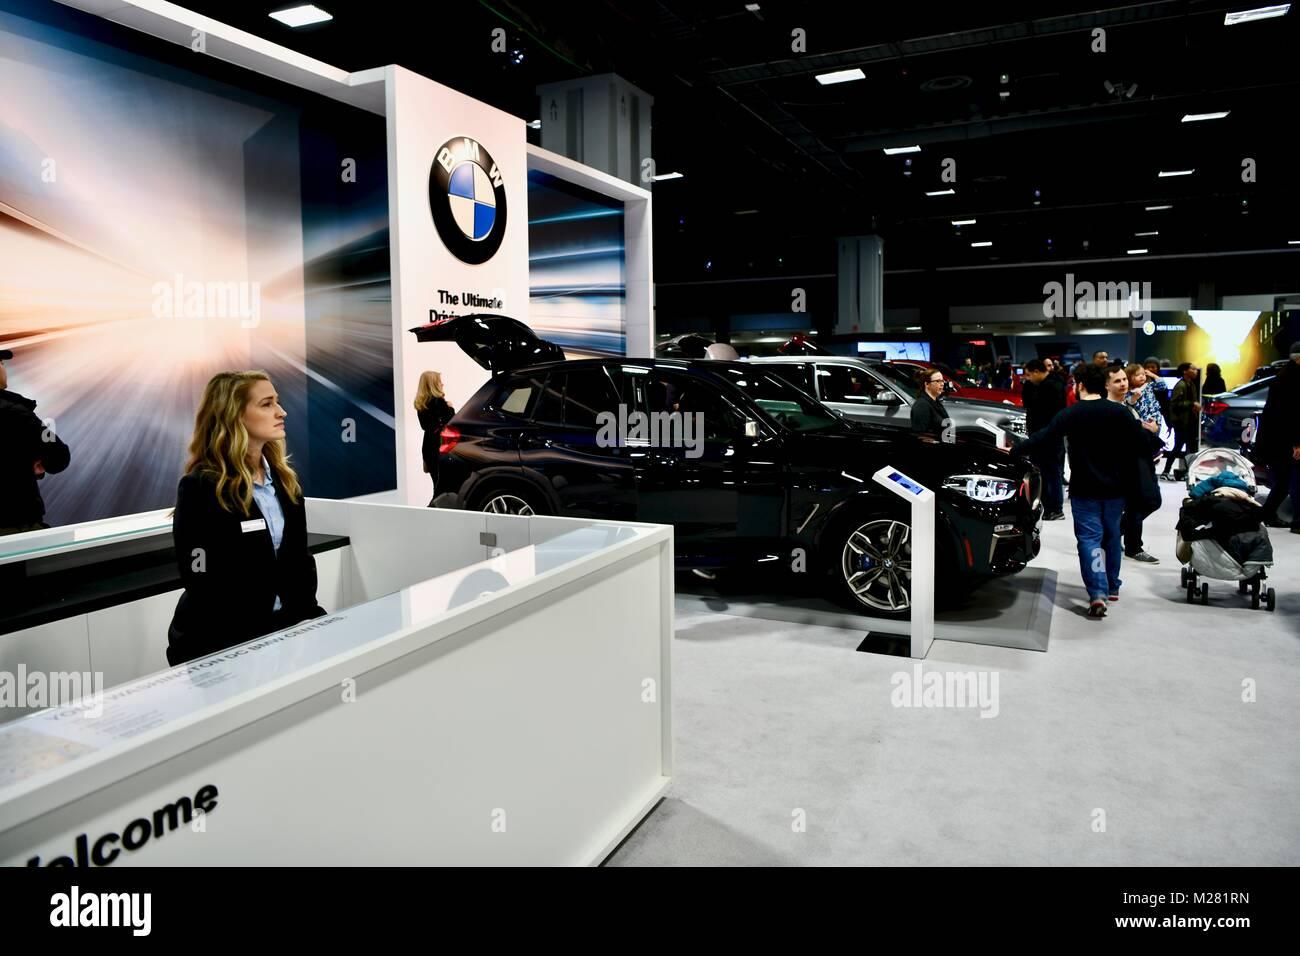 Bmw Cars At The 2018 Washington Auto Show Washington Dc Usa Stock